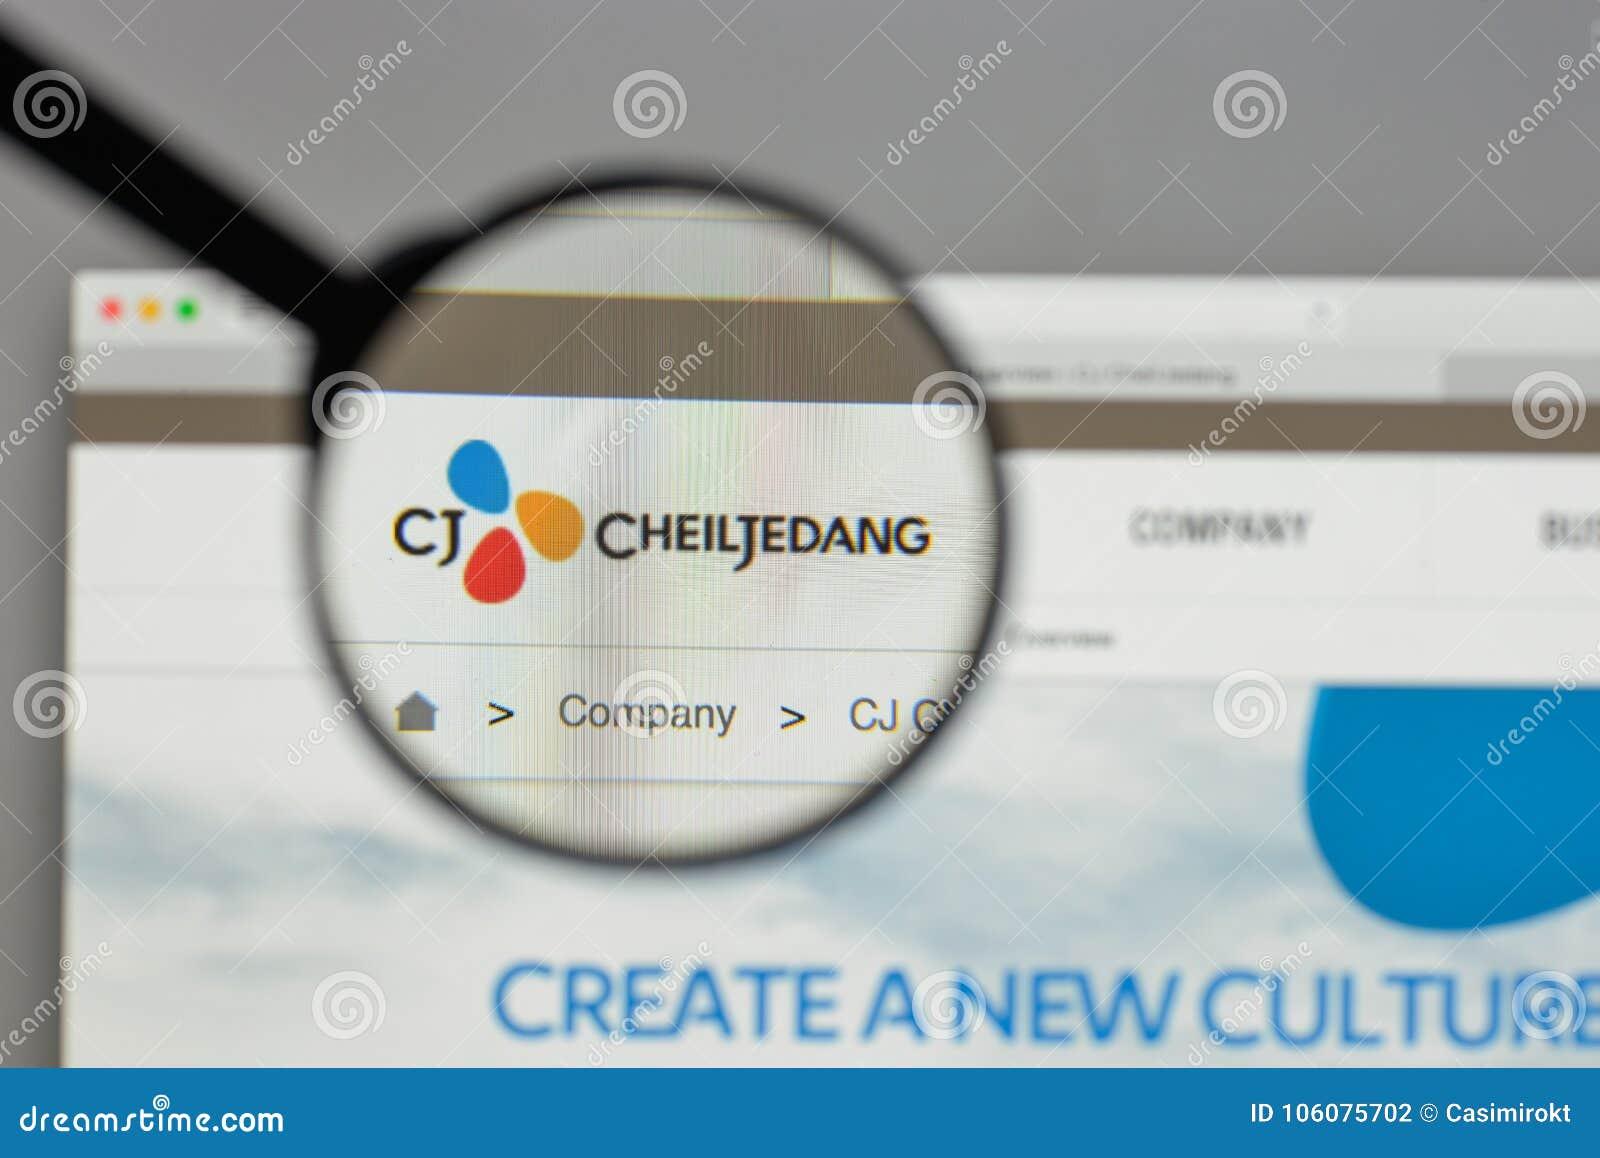 Milan, Italy - August 10, 2017: CJ Cheiljedang Logo On The